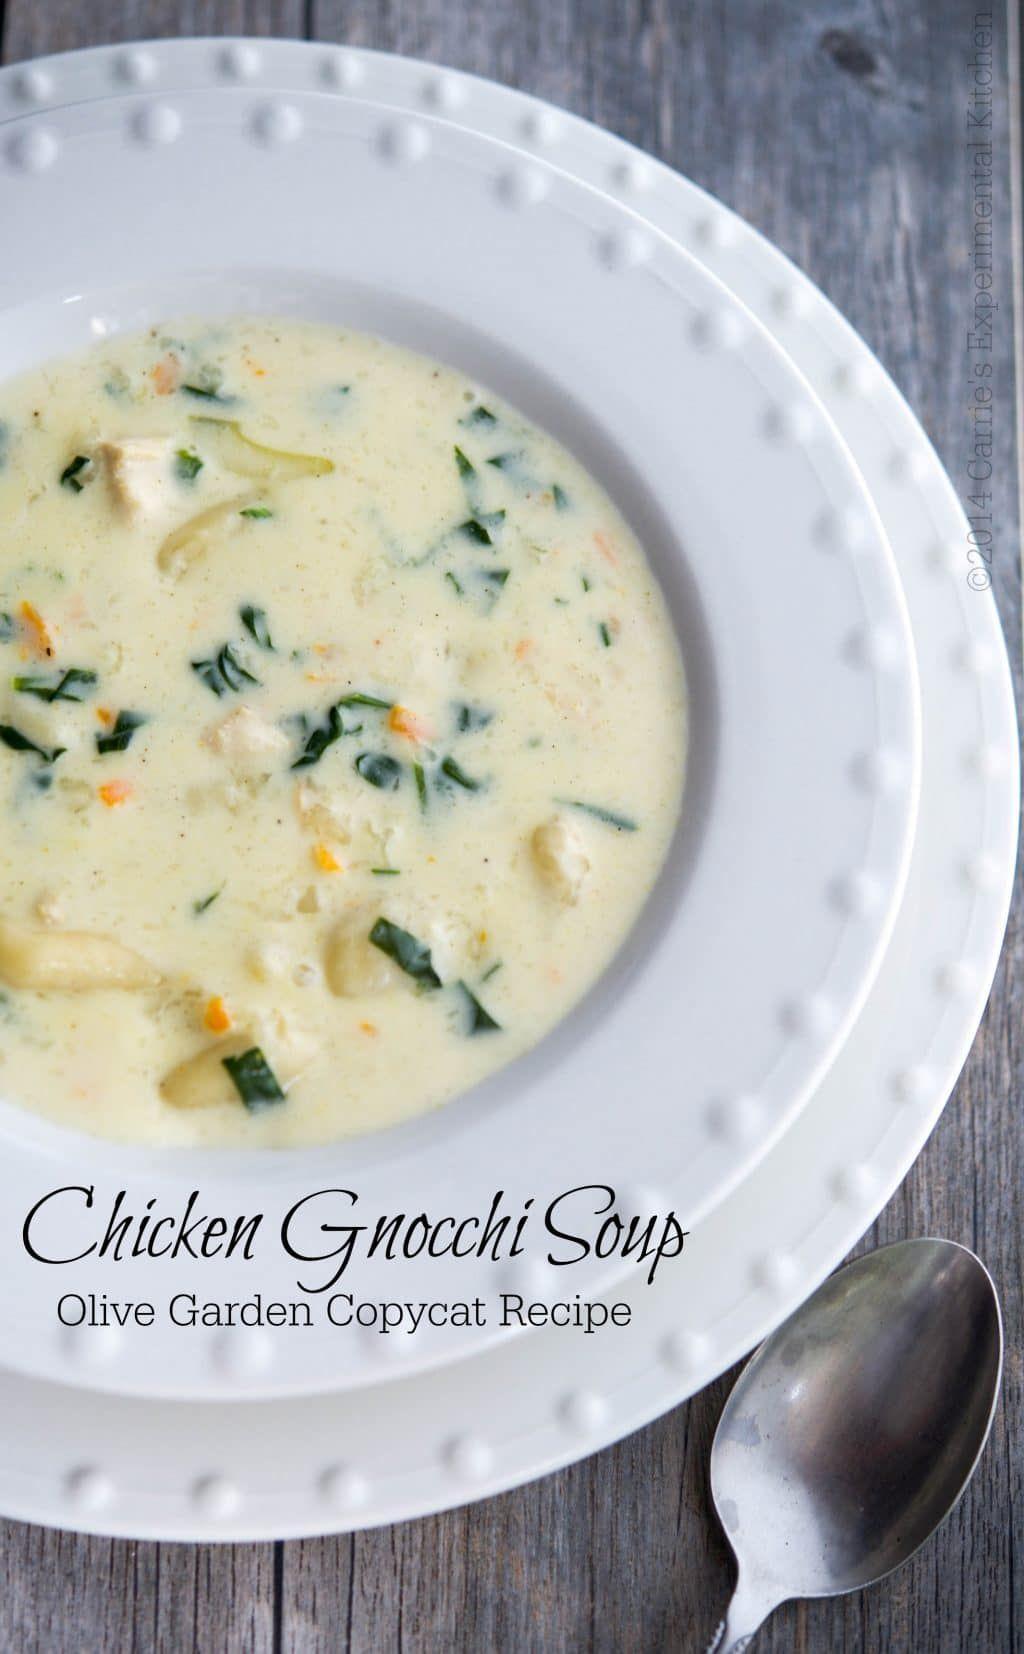 Olive Garden's Chicken and Gnocchi Soup Recipe